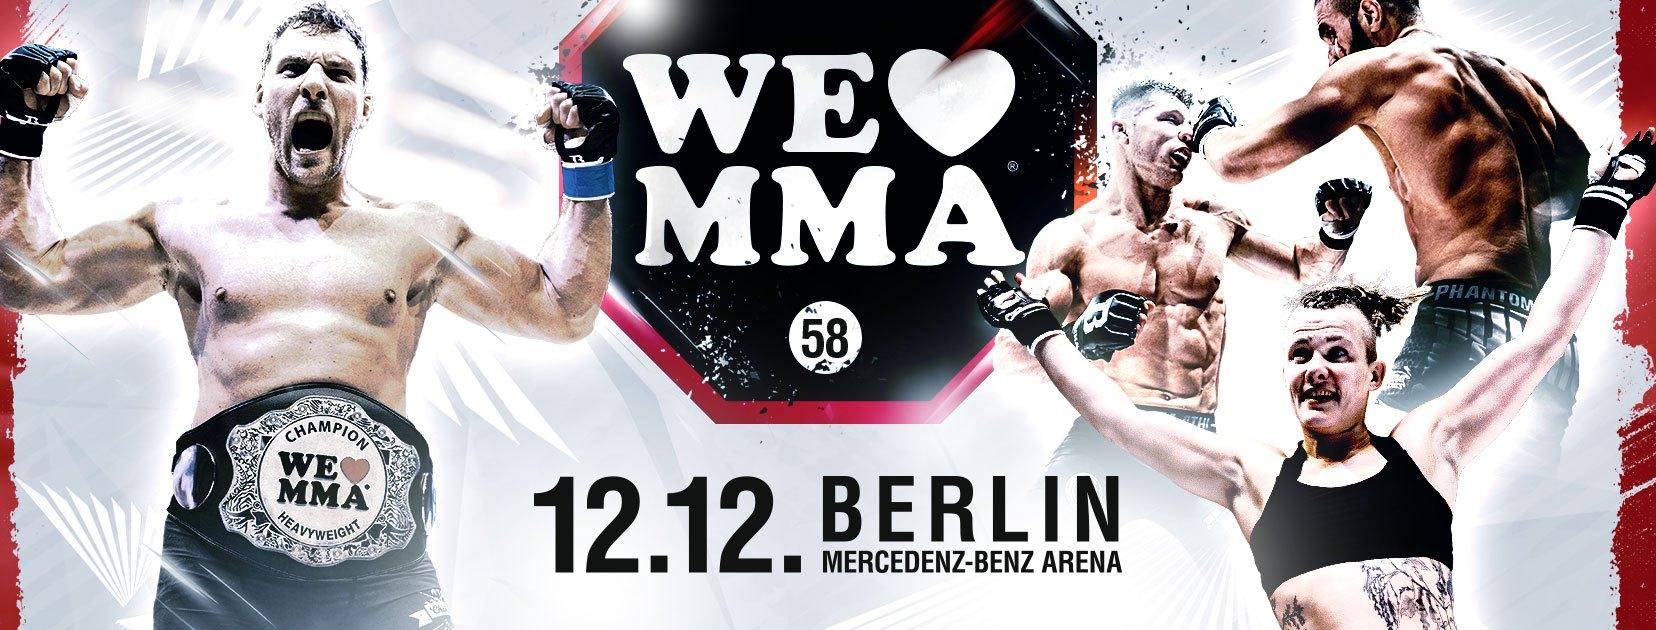 We love MMA Berlin